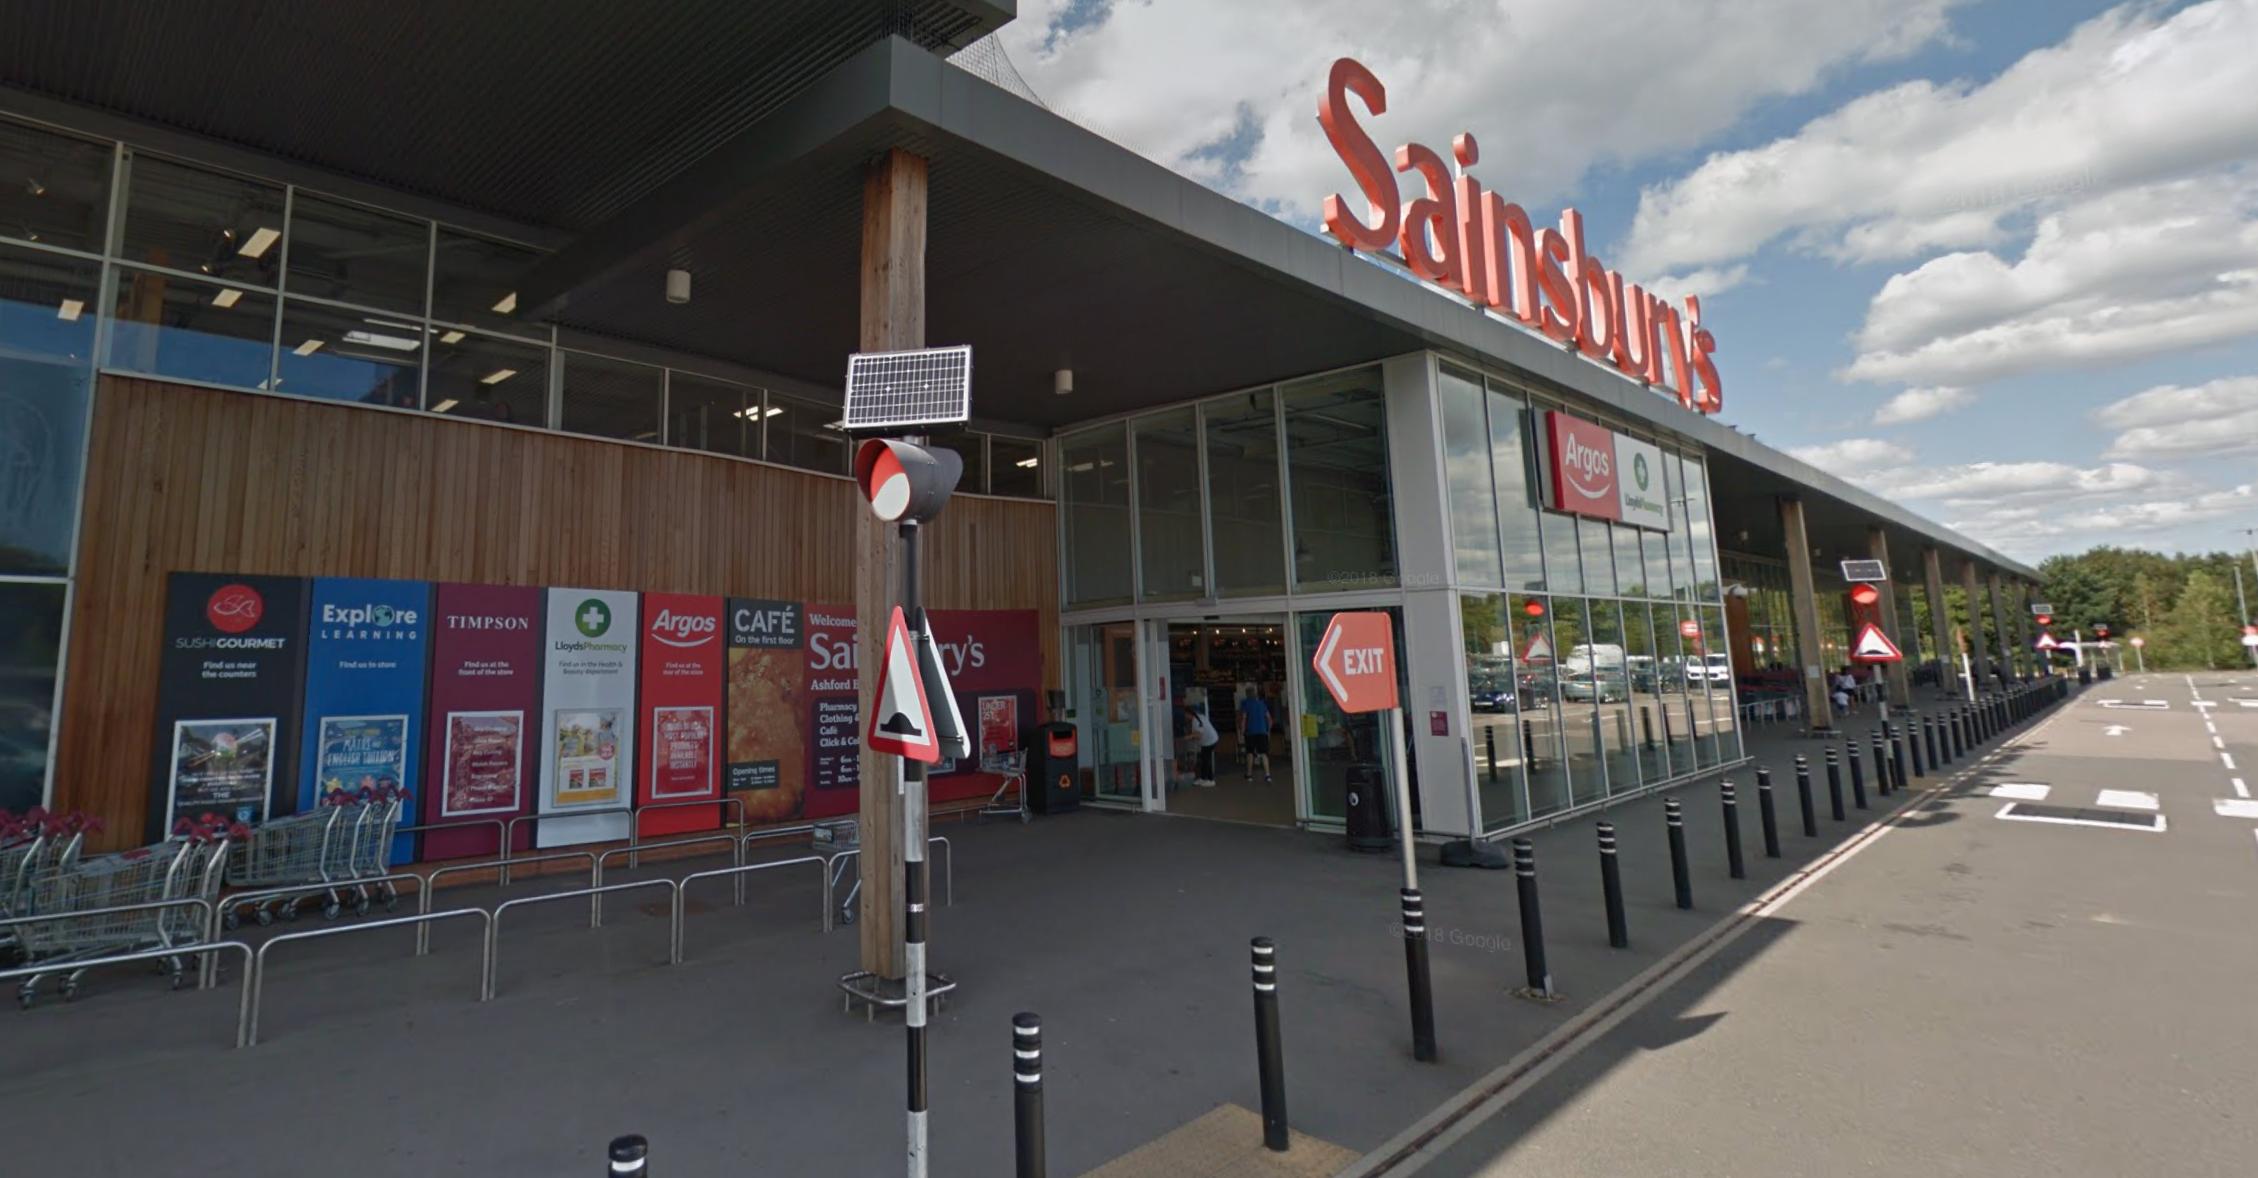 Supermarket Income REIT property, Sainsbury's, Ashford (Photo: Google Maps)